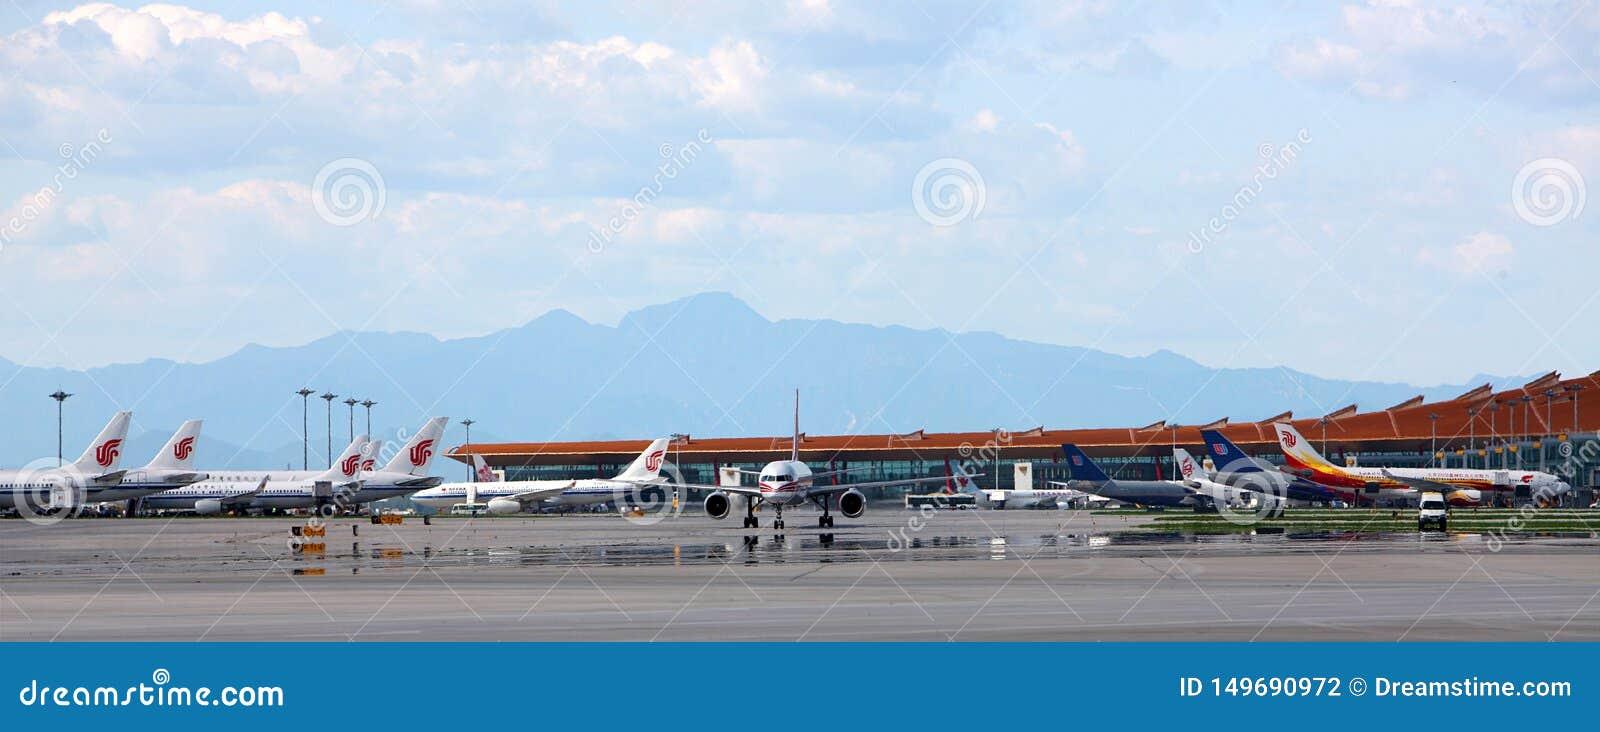 China Beijing Capital Airport